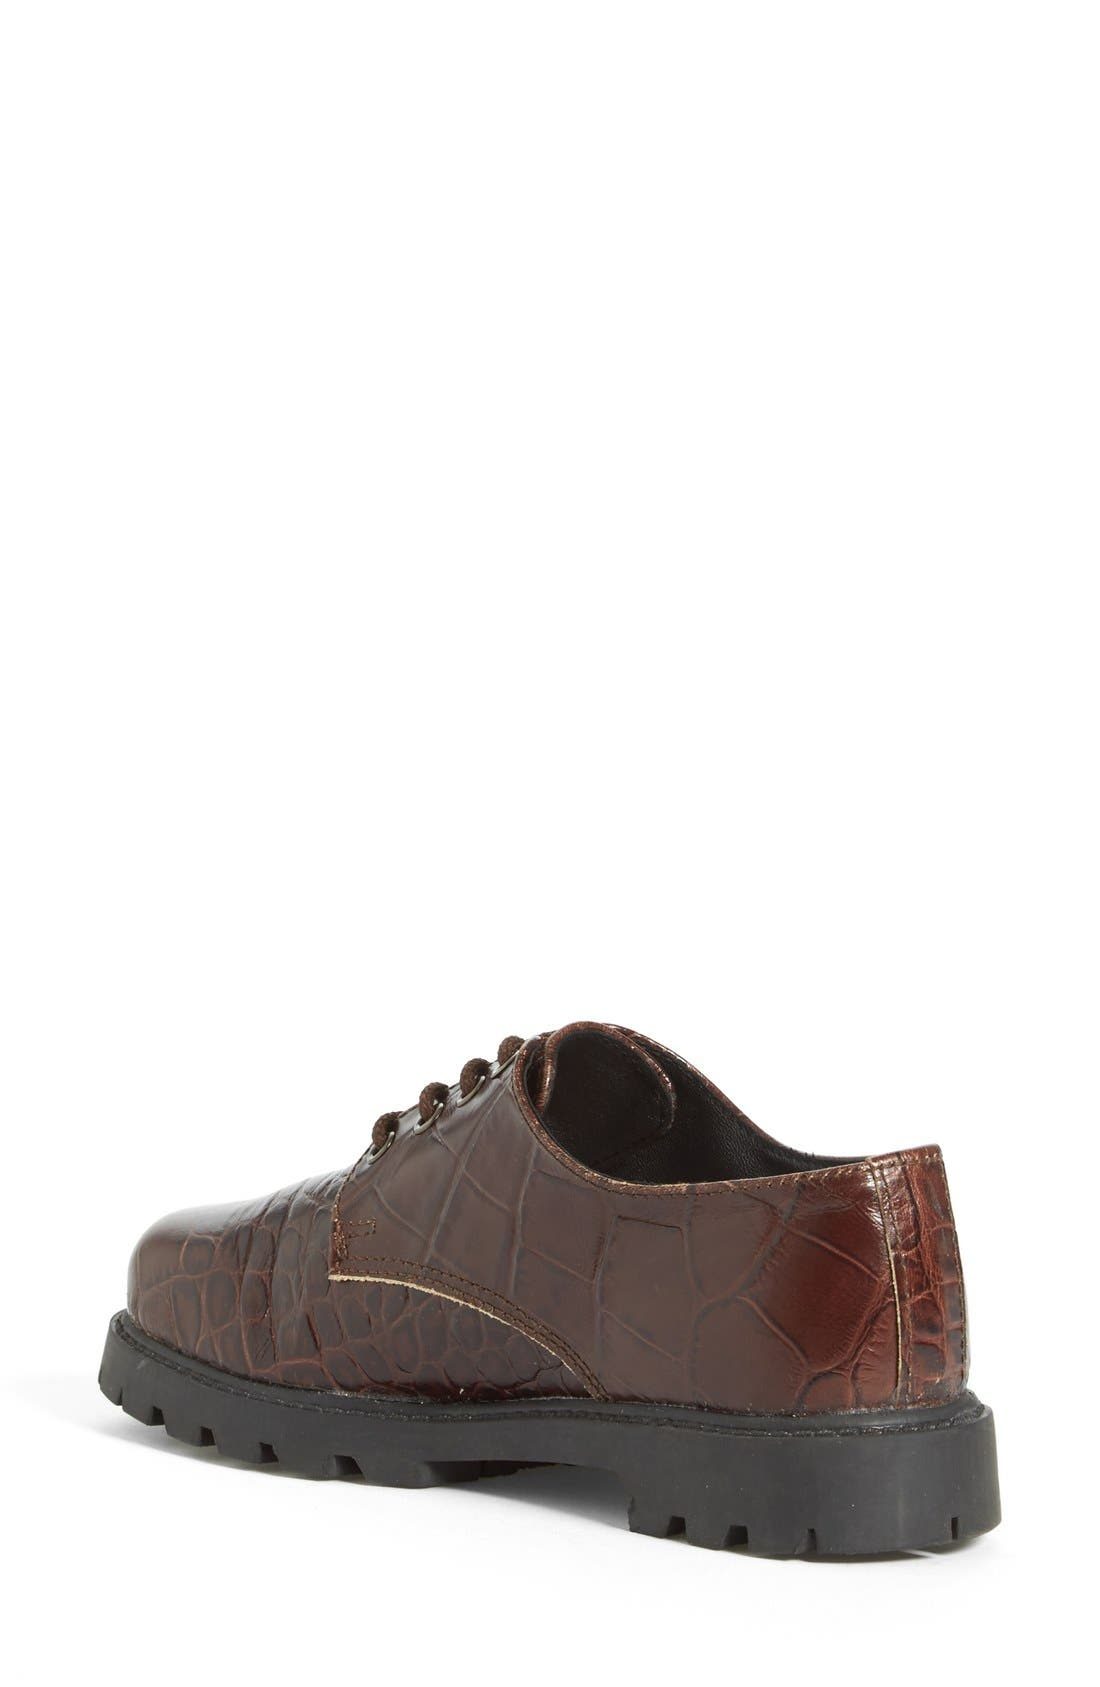 'School Shoe' Lace-Up Oxford,                             Alternate thumbnail 4, color,                             210